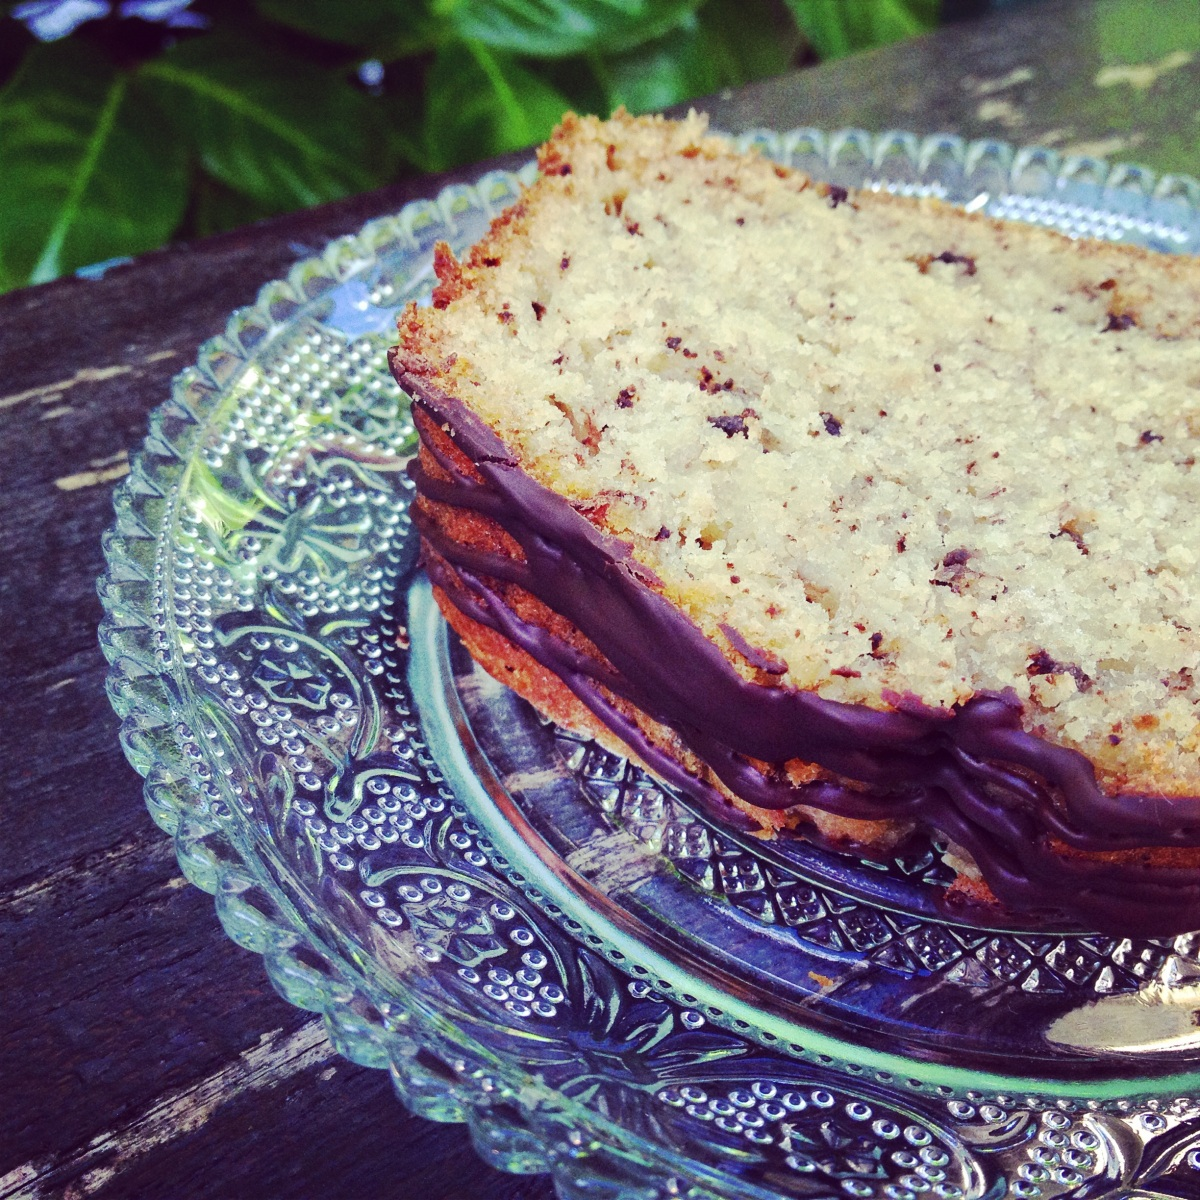 BBBBB : Big-Banana-Breakfast-Bread-Bonjour !